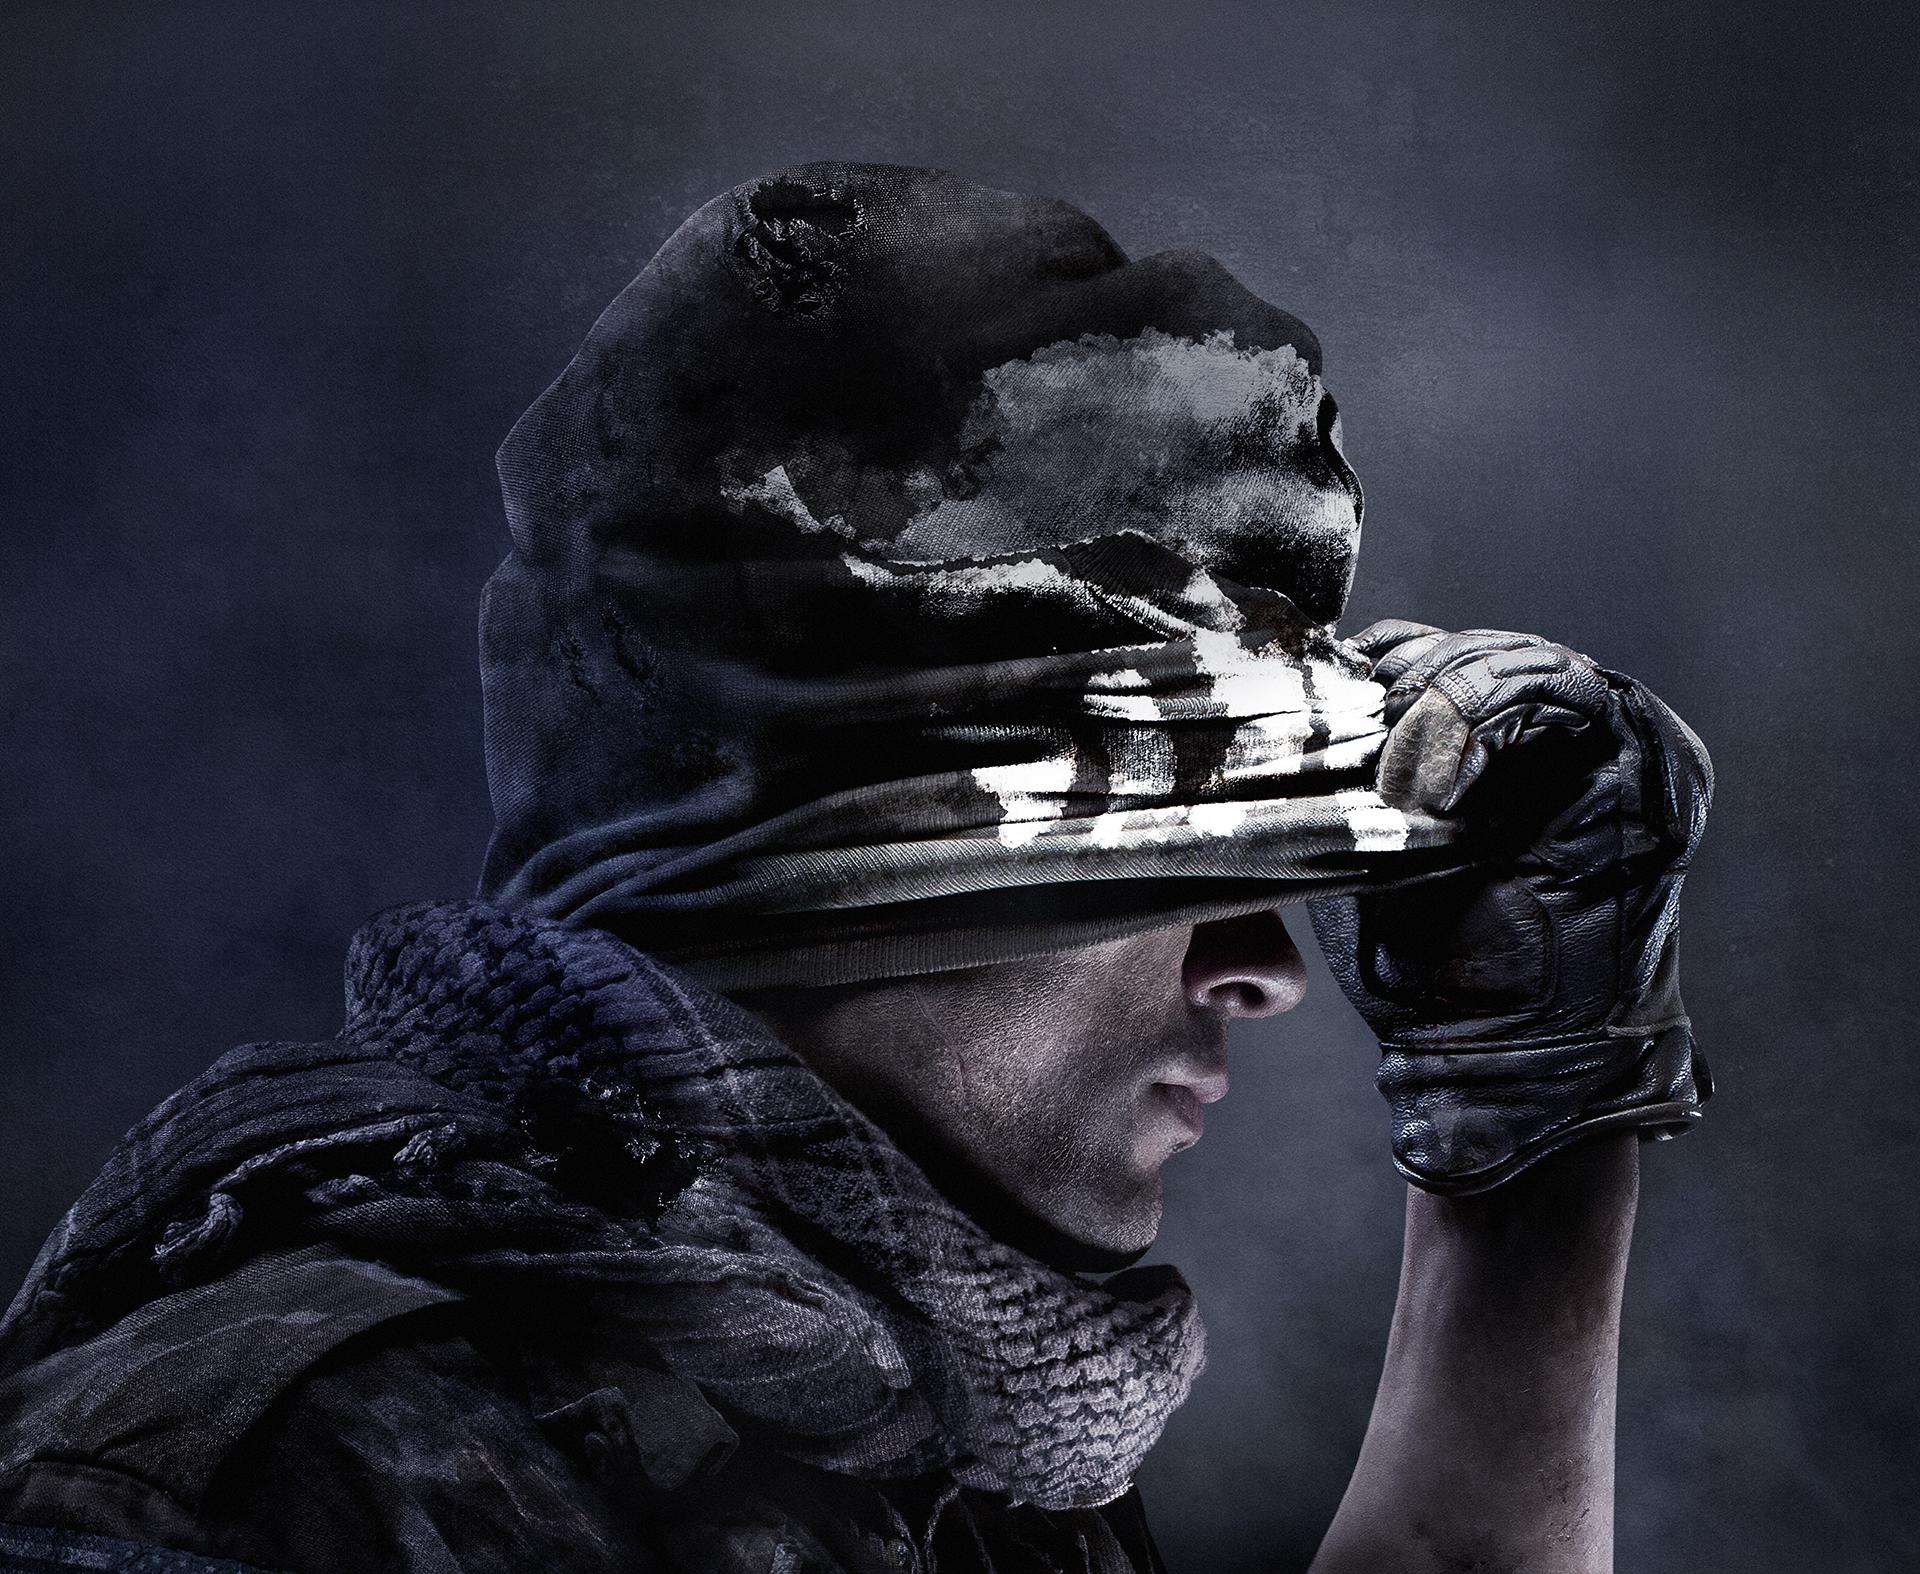 [N][Spoiler] Se filtra la lista de logros de Call of Duty...